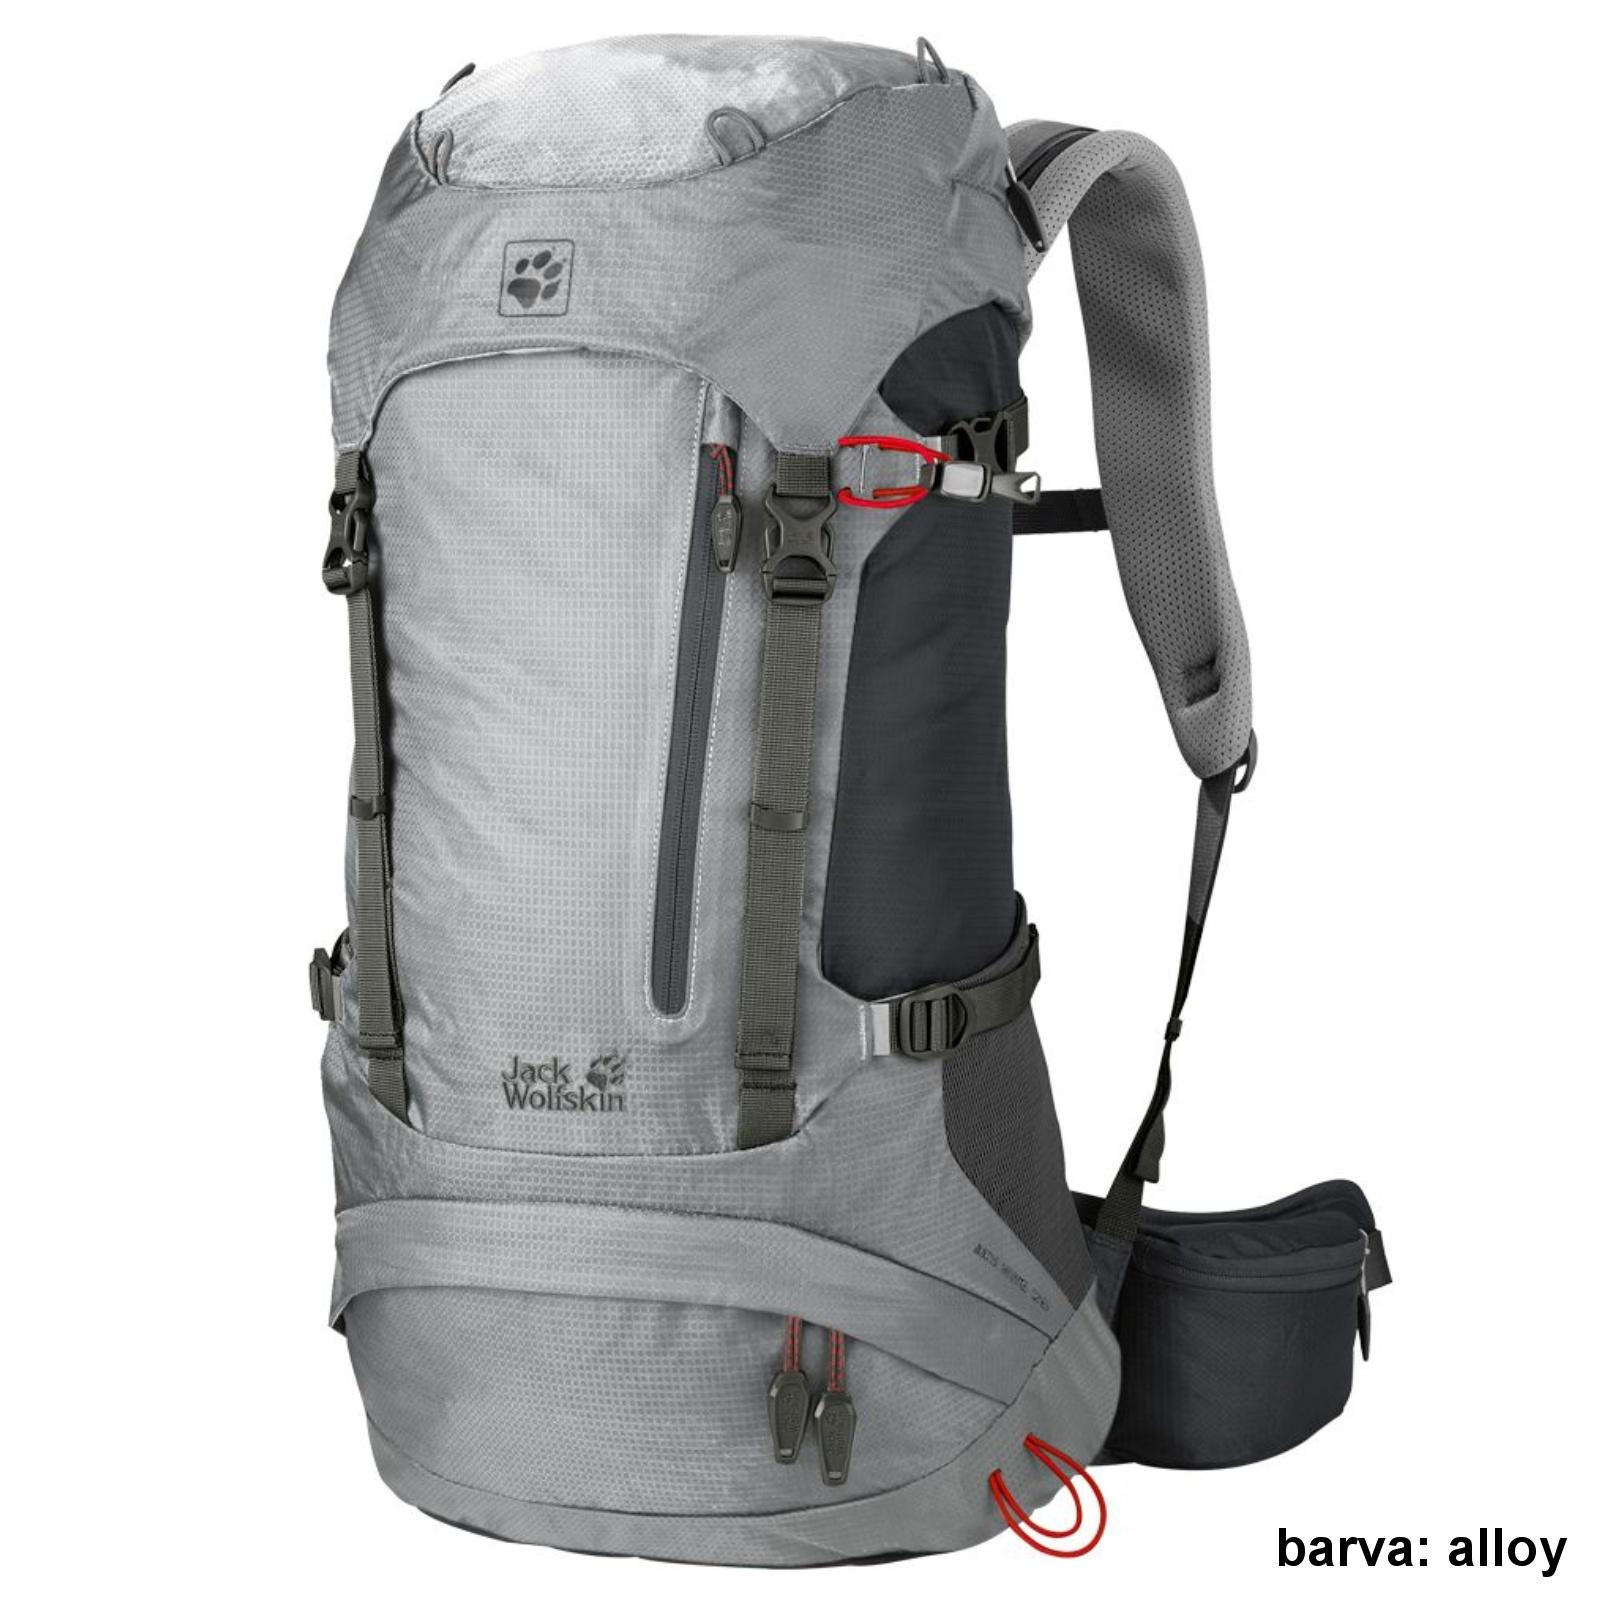 Batoh JACK WOLFSKIN ACS Hike Pack 26 l - alloy